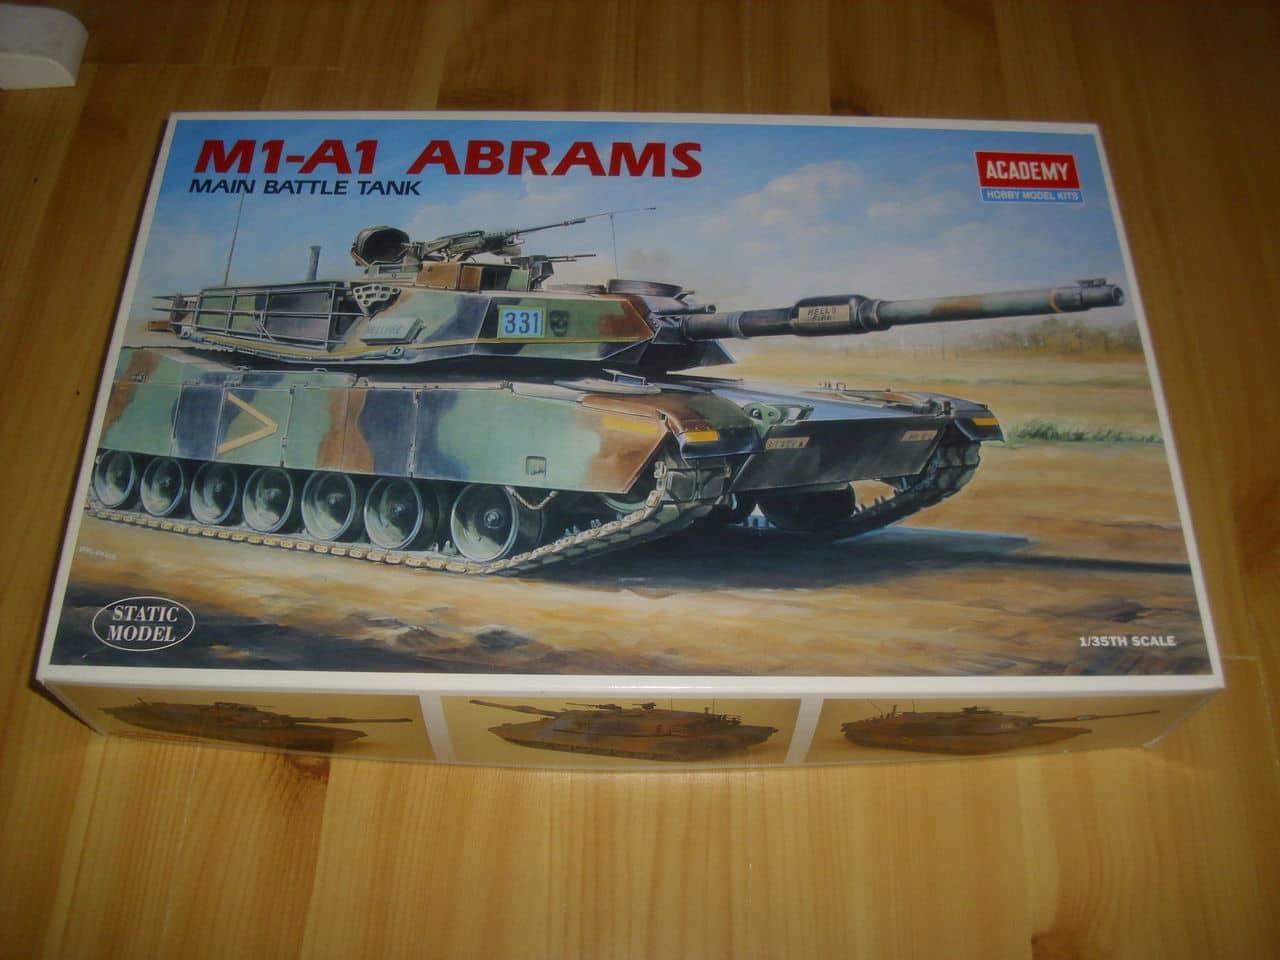 M1A1 Abrams 1/35 - Academy DSCI0699